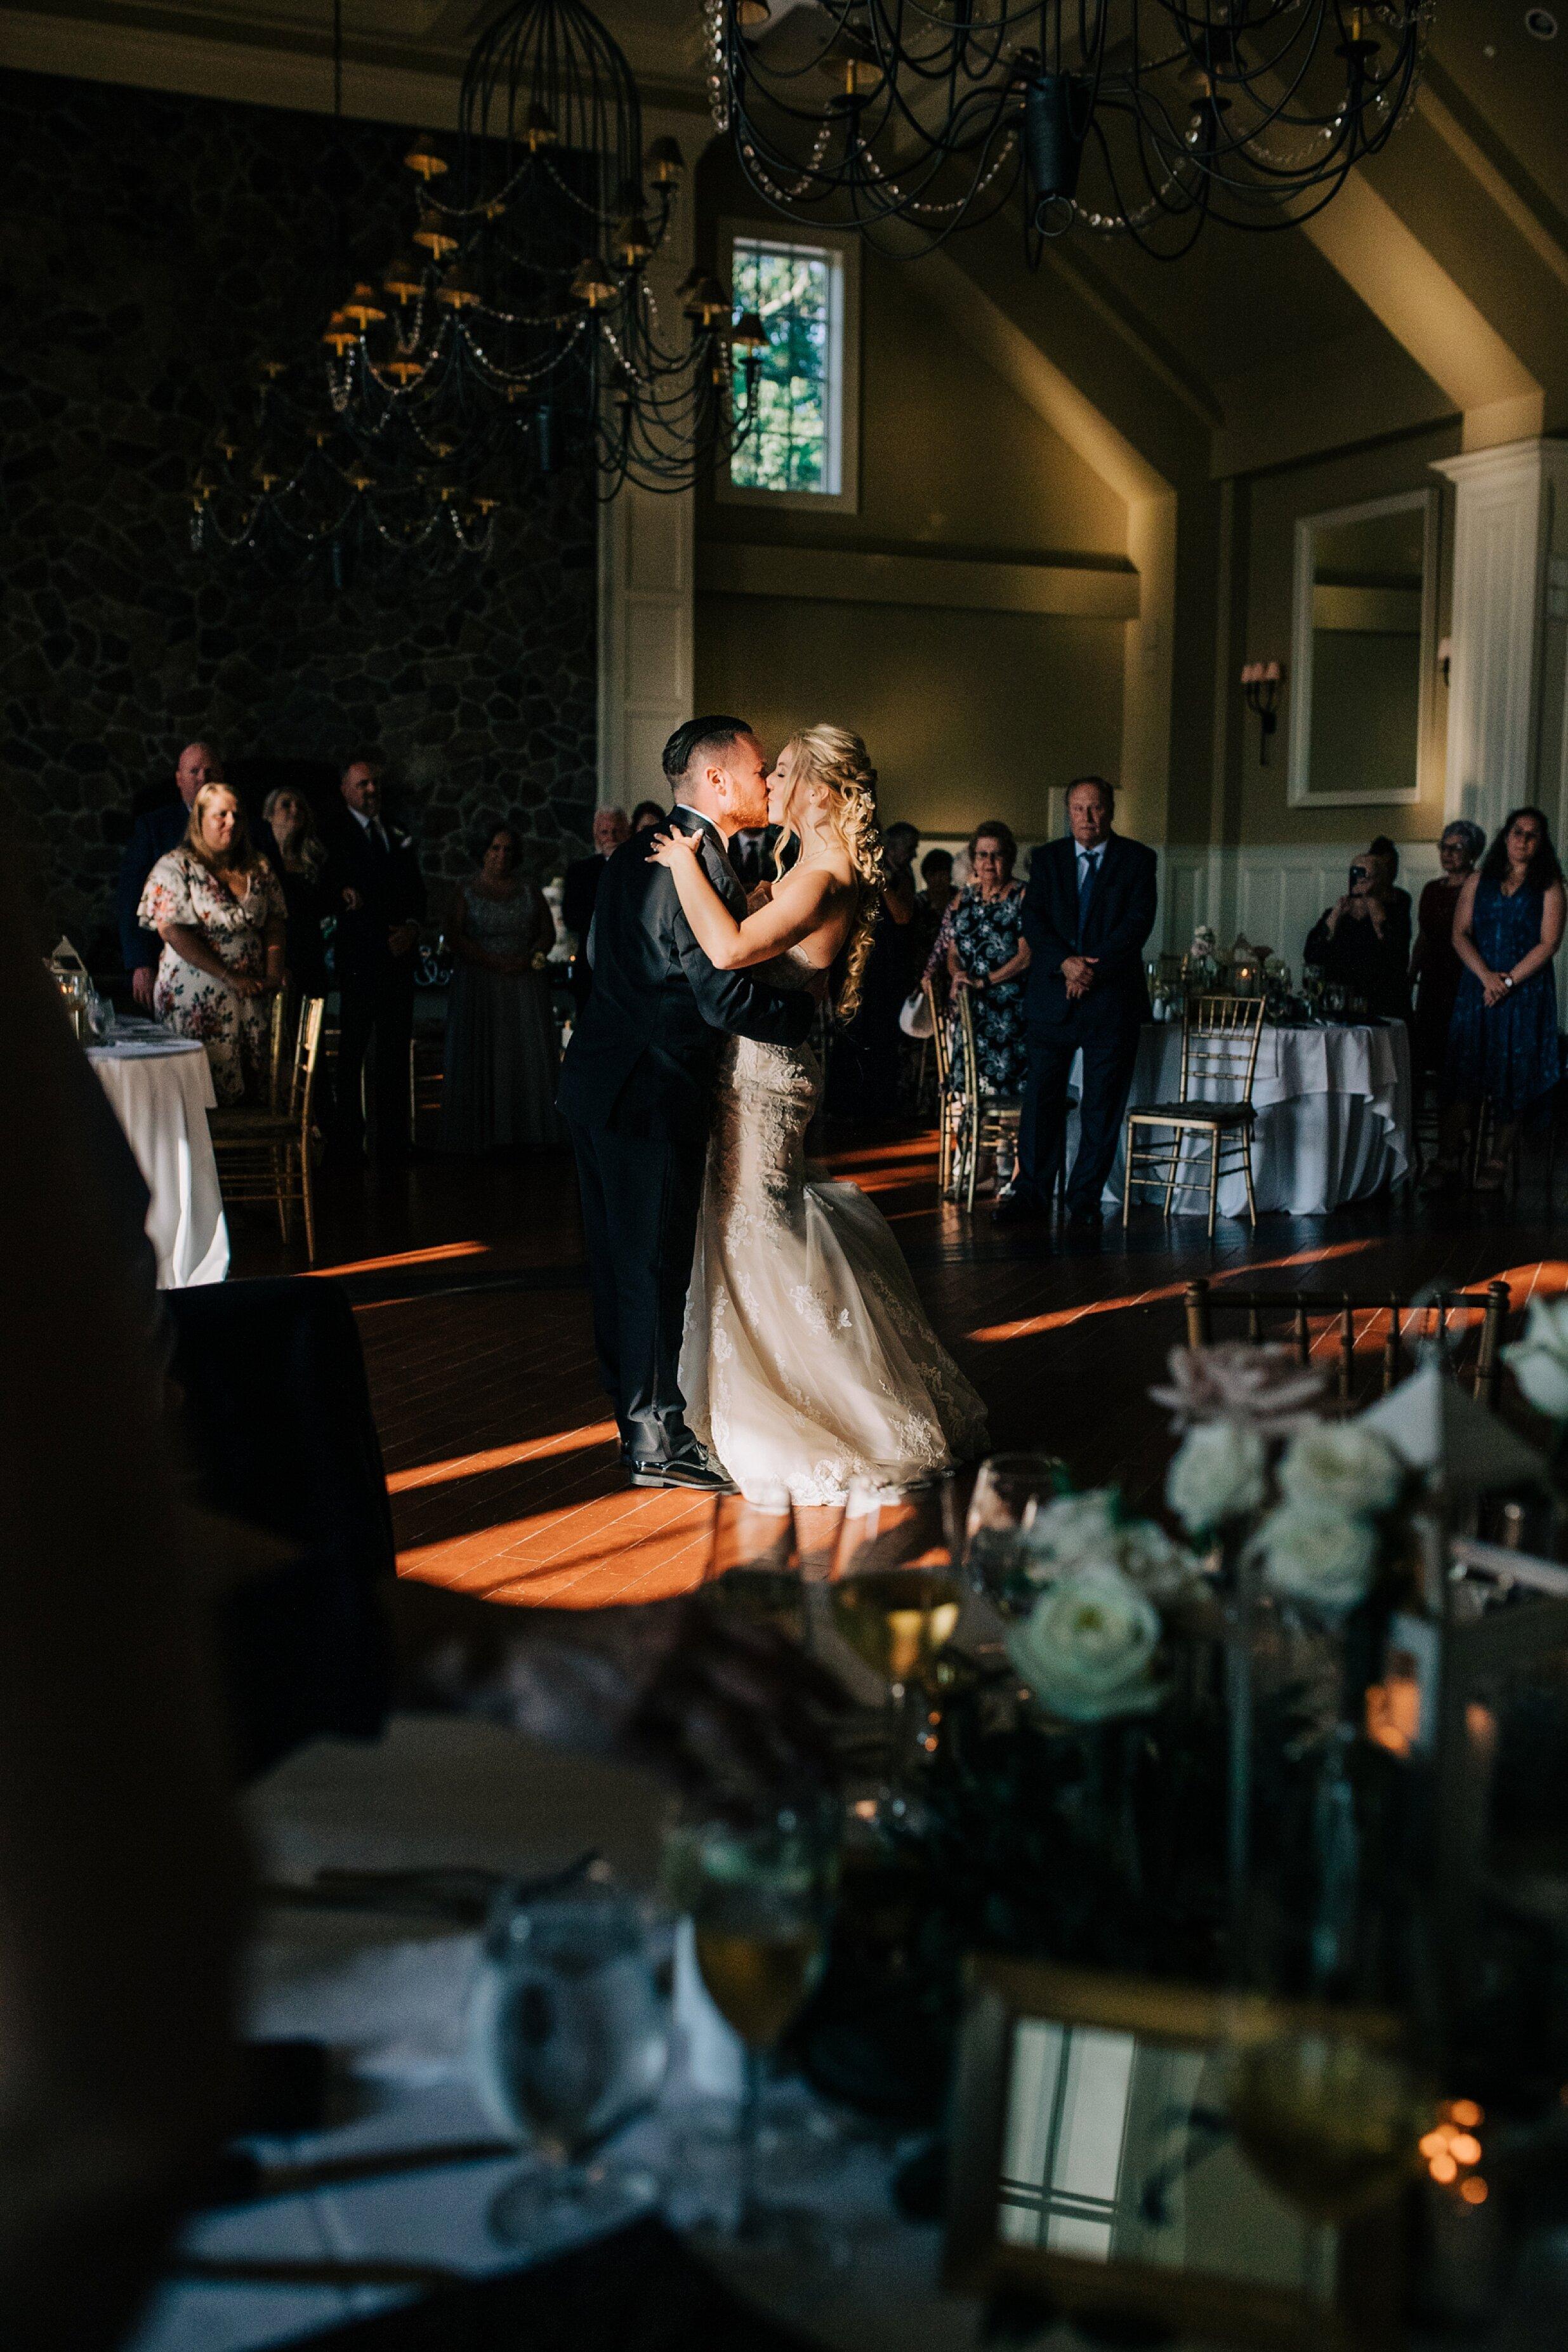 ryland-inn-nj-photographer-wedding_0055.jpg